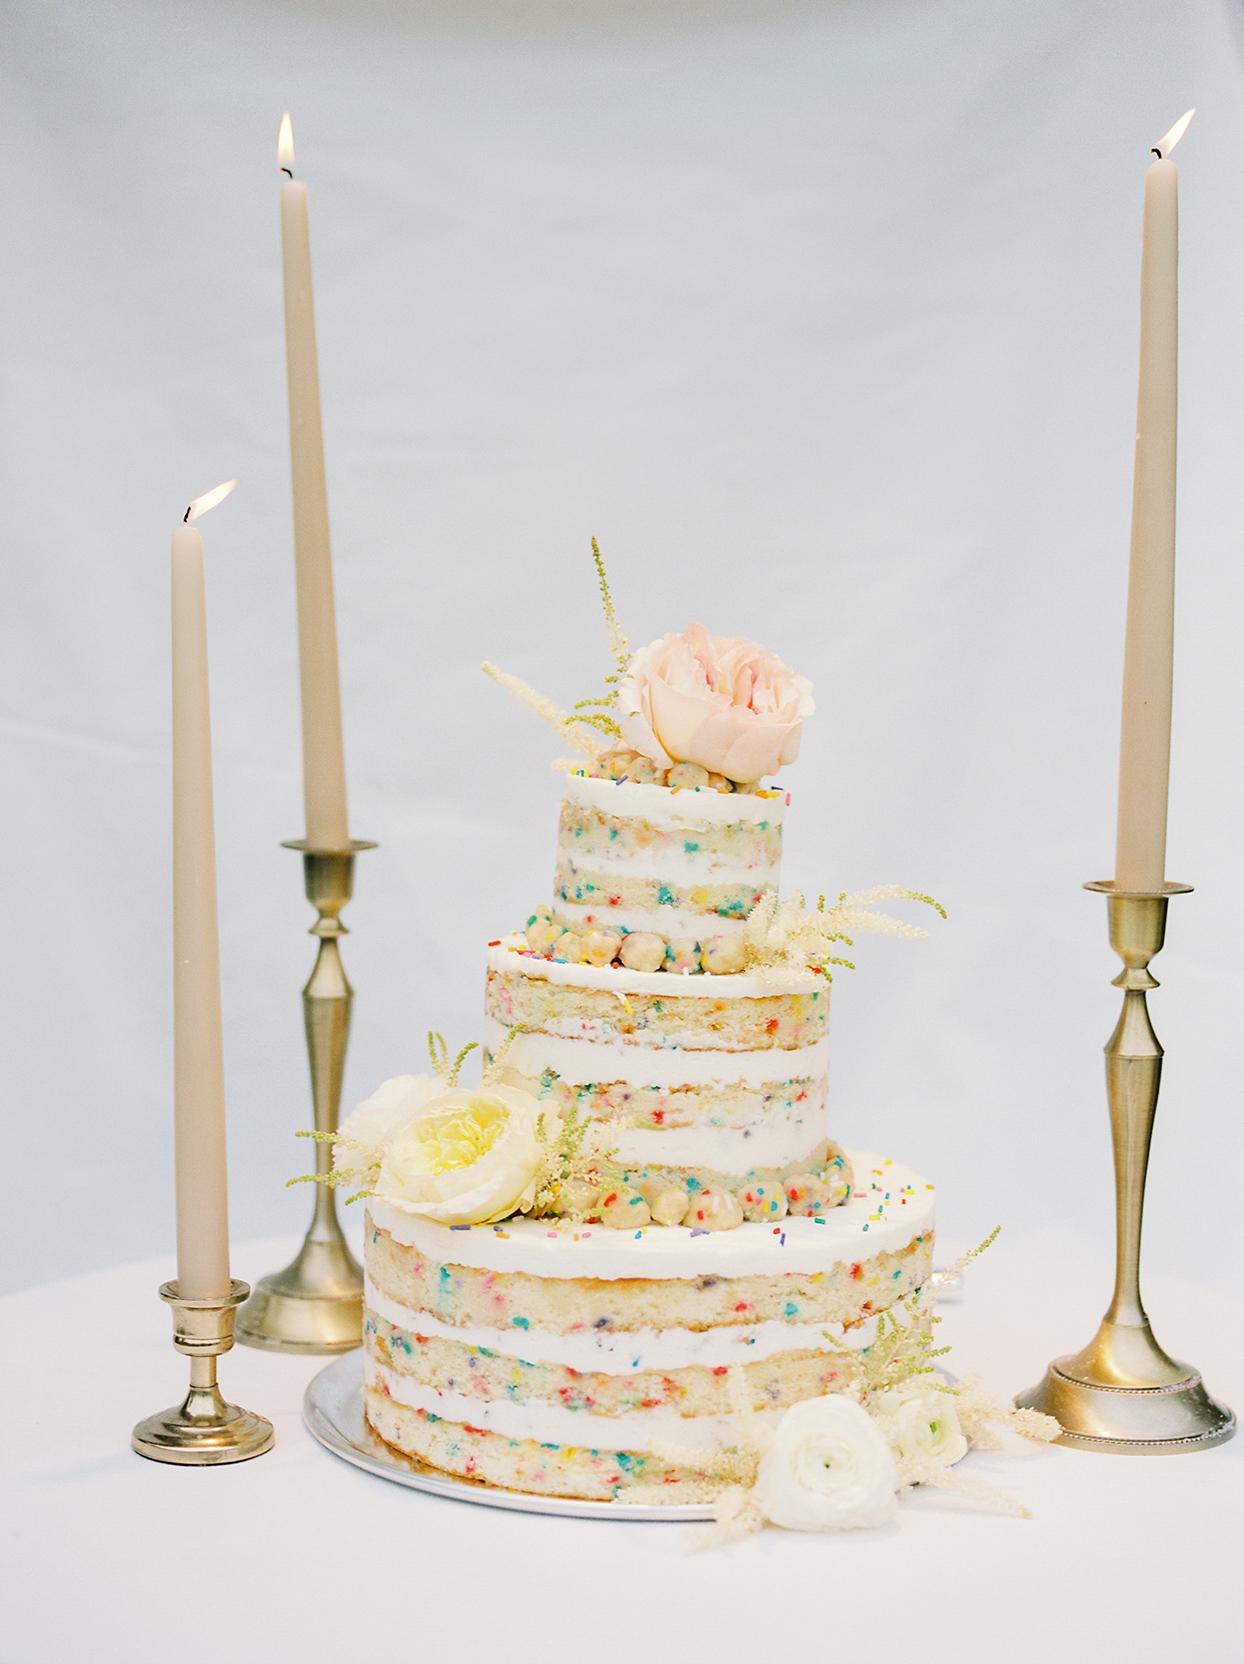 mika steve funfetti naked wedding cake